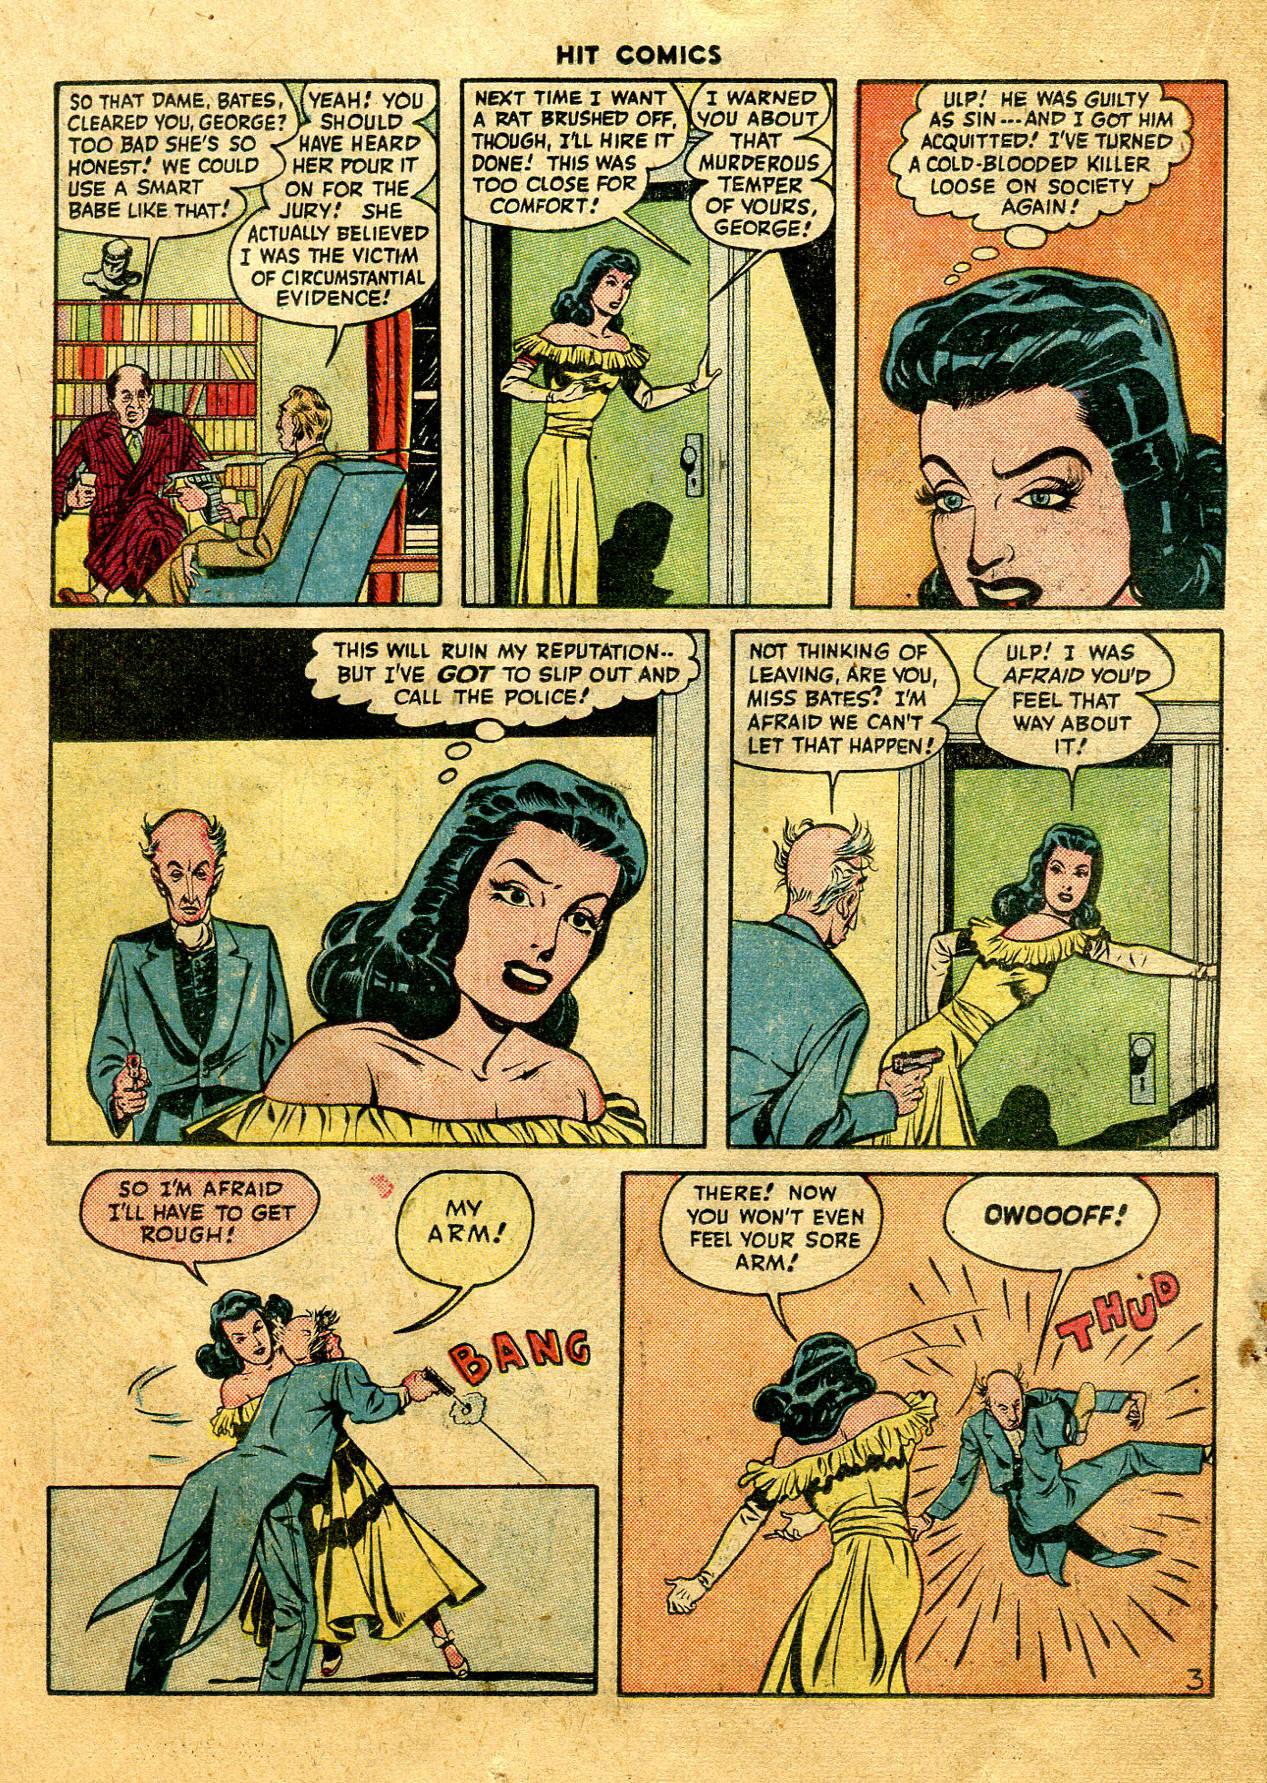 Read online Hit Comics comic -  Issue #44 - 32